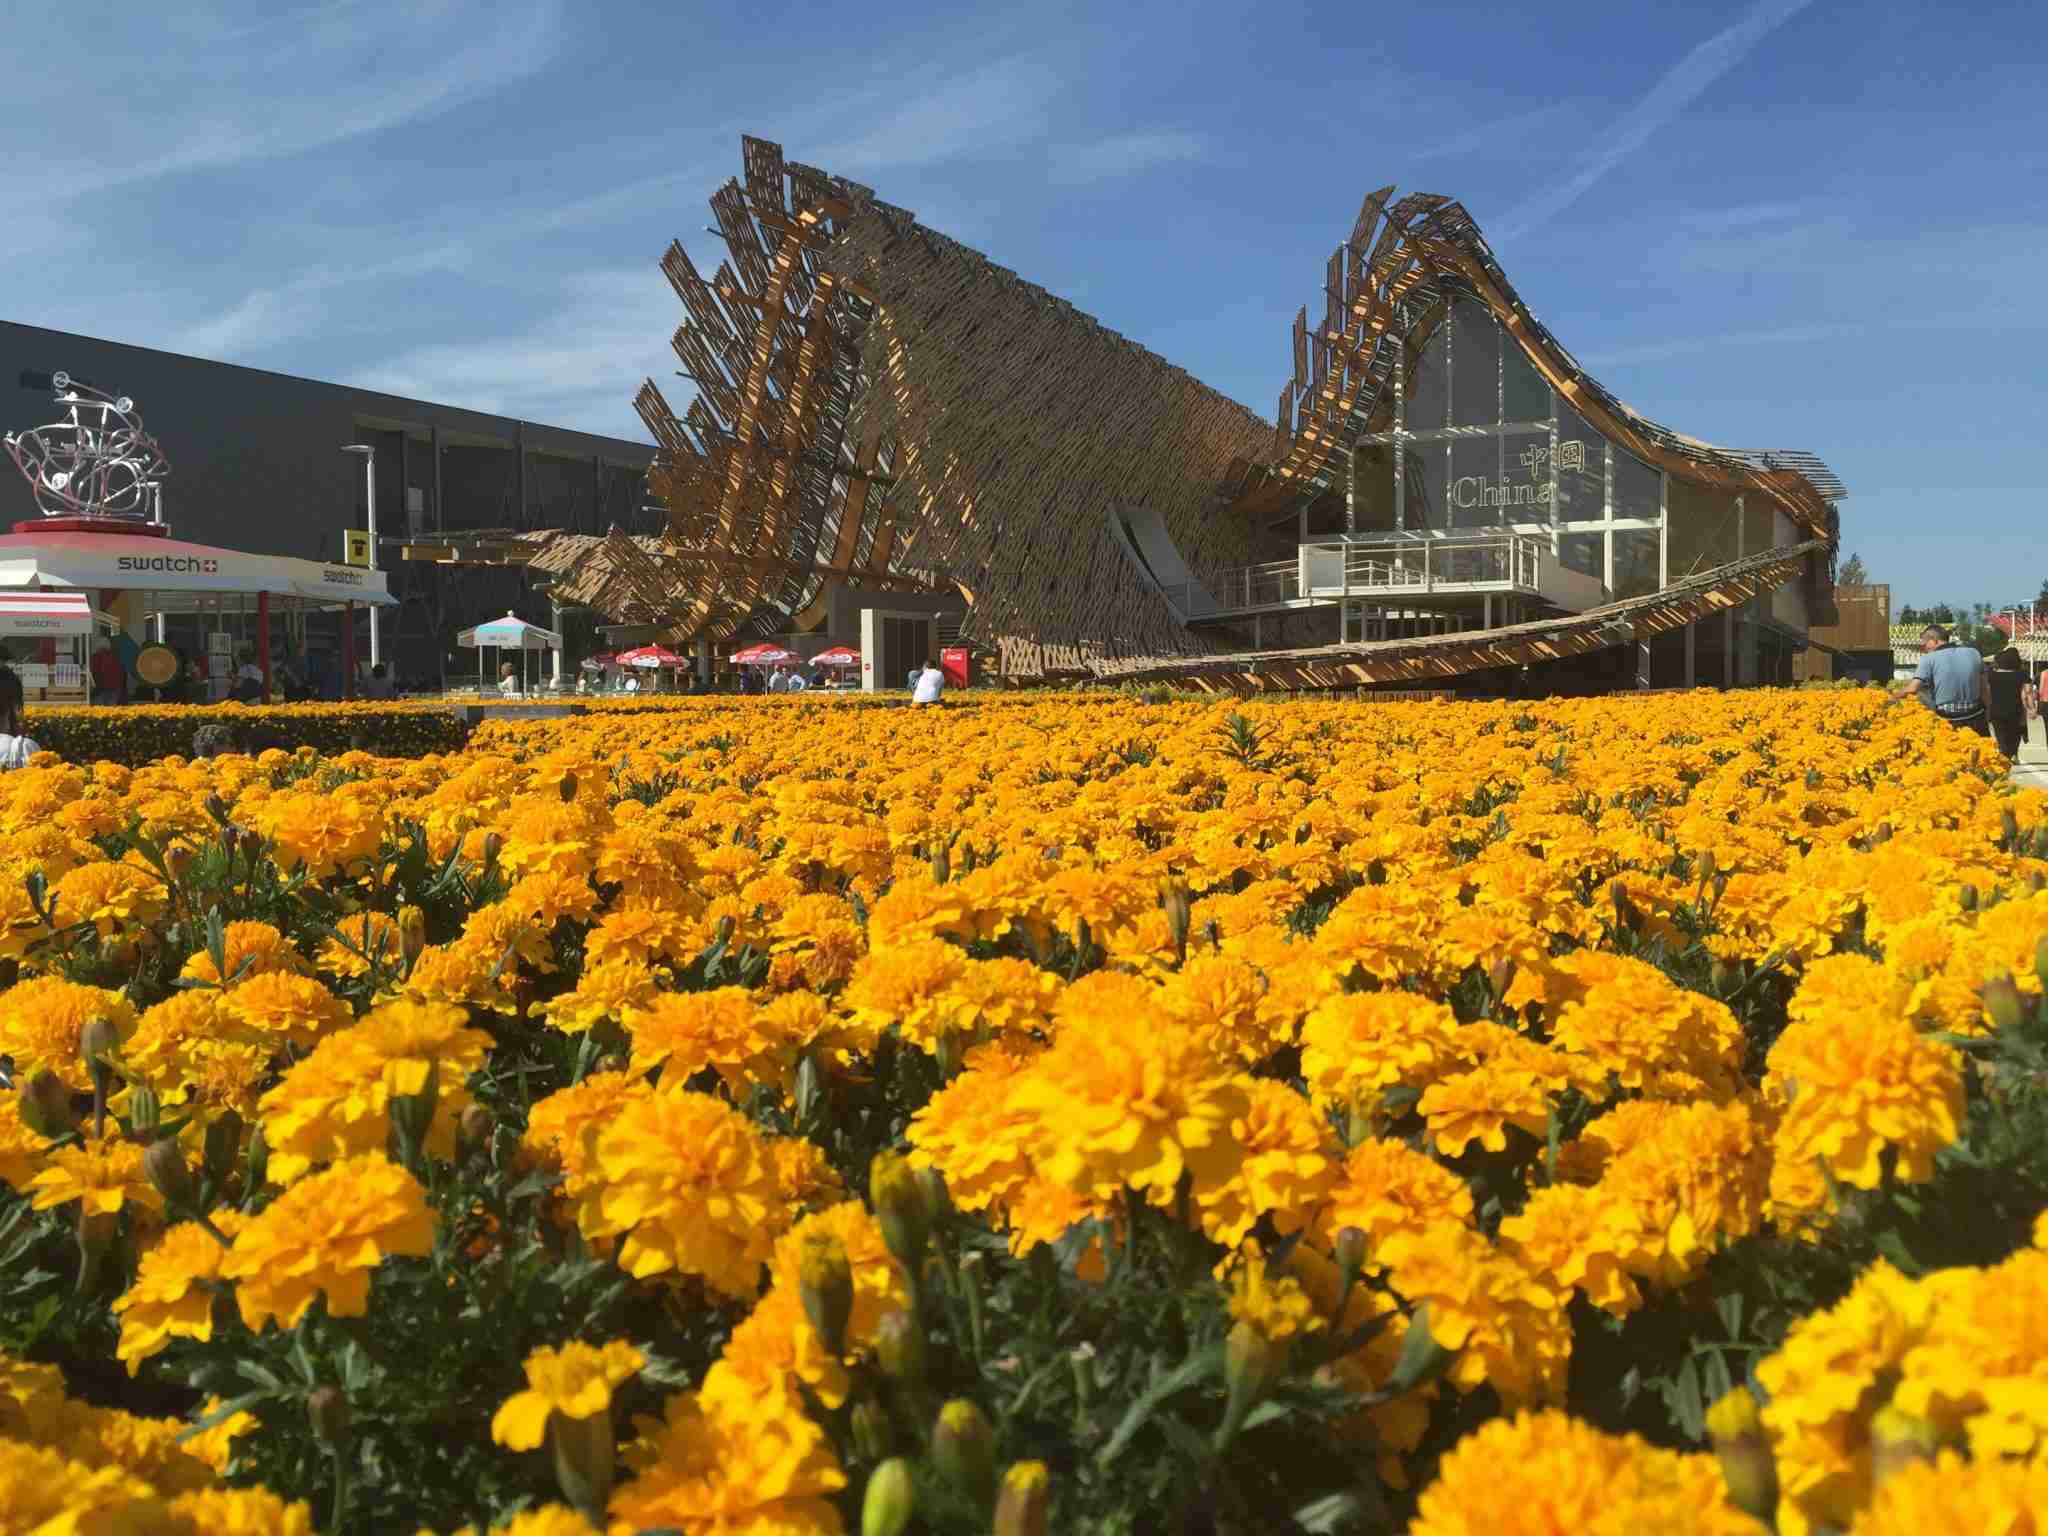 expo-2015-top-5-padiglioni-piu-belli